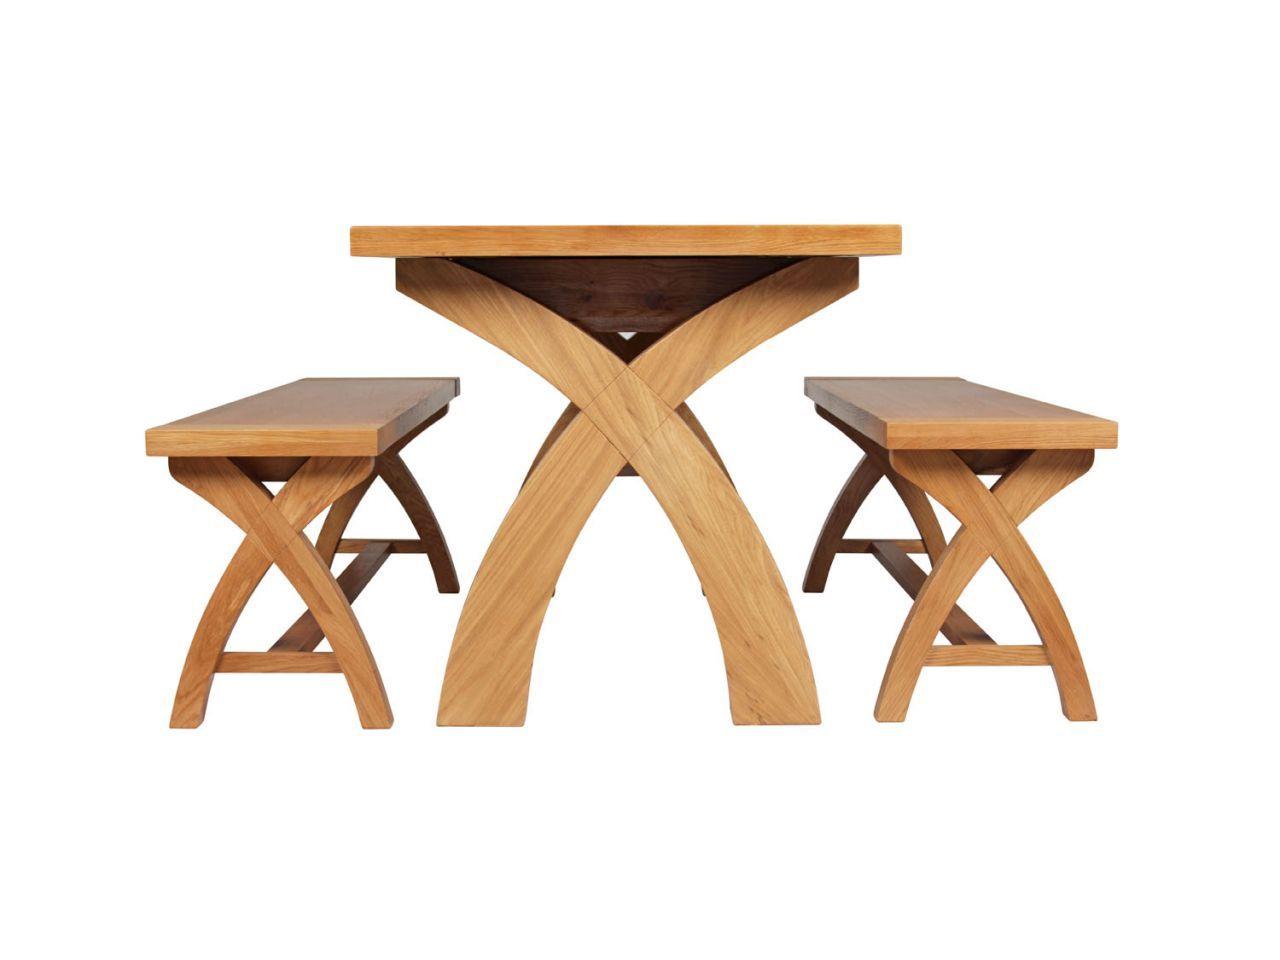 Country Oak 180cm Extending Cross Leg Table And 2 120cm Cross Leg Bench Set In 2020 Table And Bench Set Dining Table Legs Oak Furniture